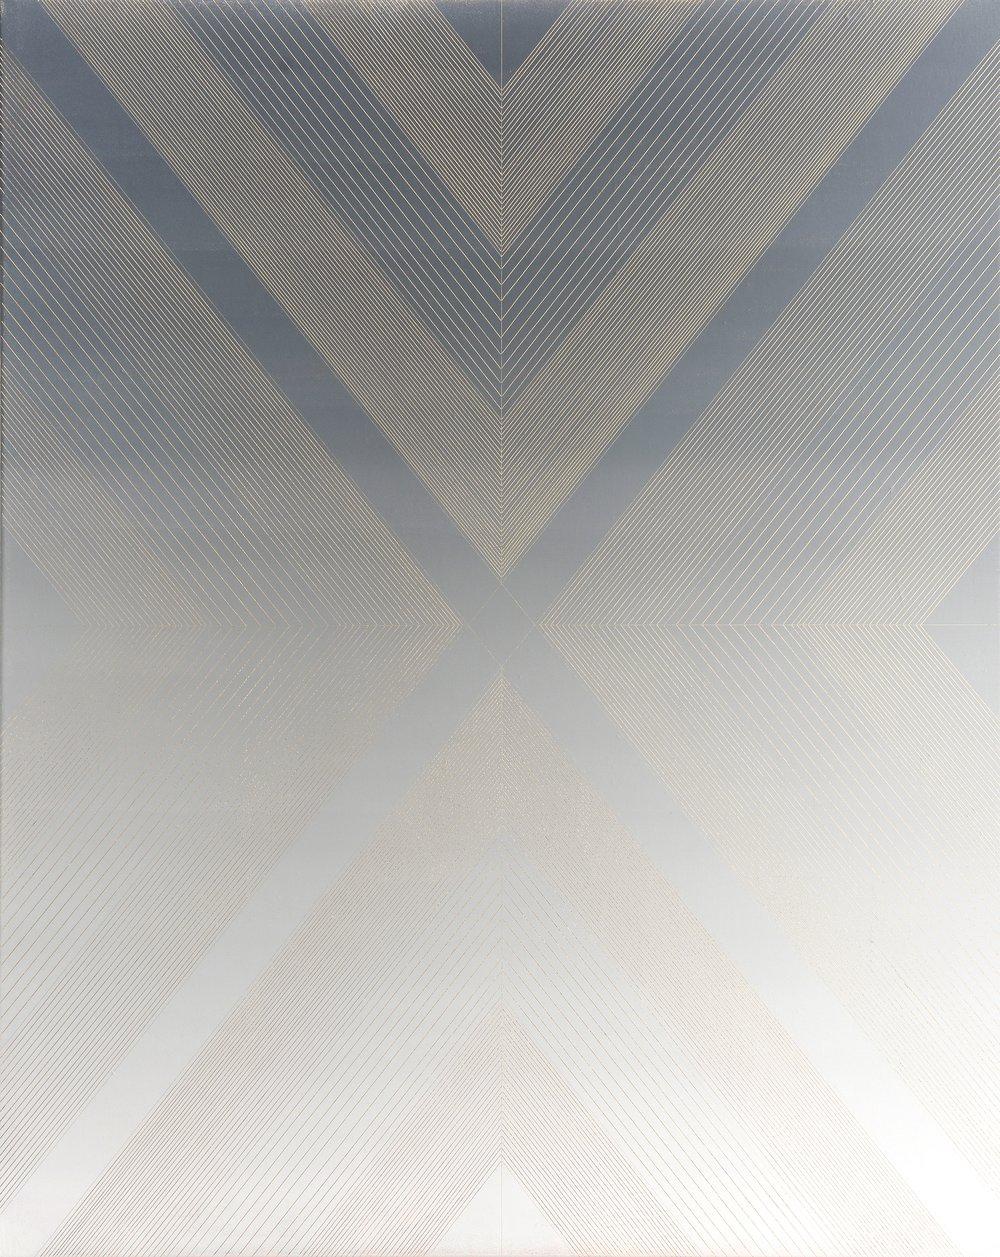 X(3), 2017